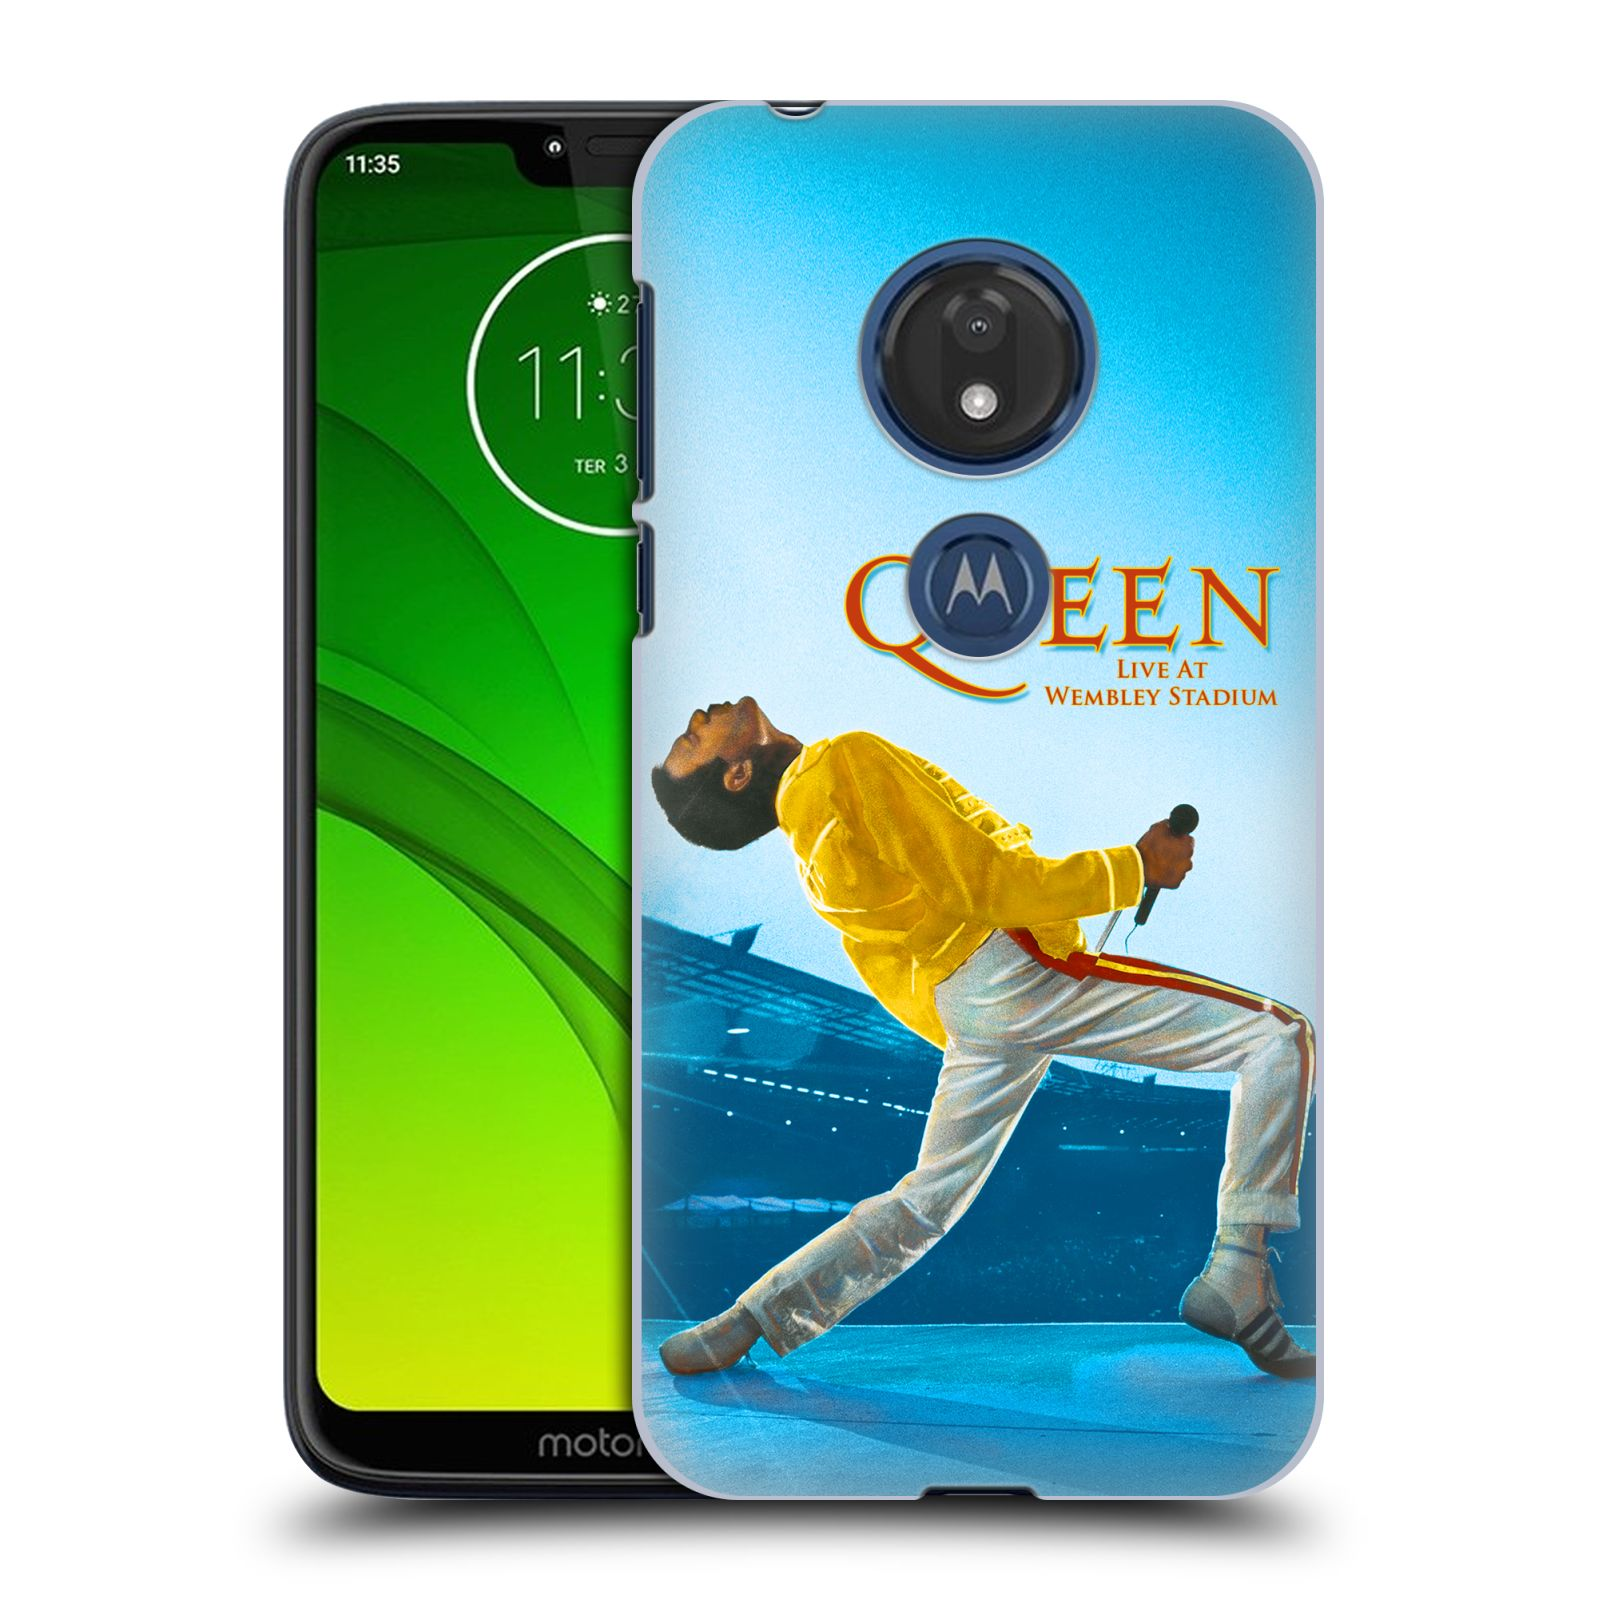 Plastové pouzdro na mobil Motorola Moto G7 Play - Head Case - Queen - Freddie Mercury